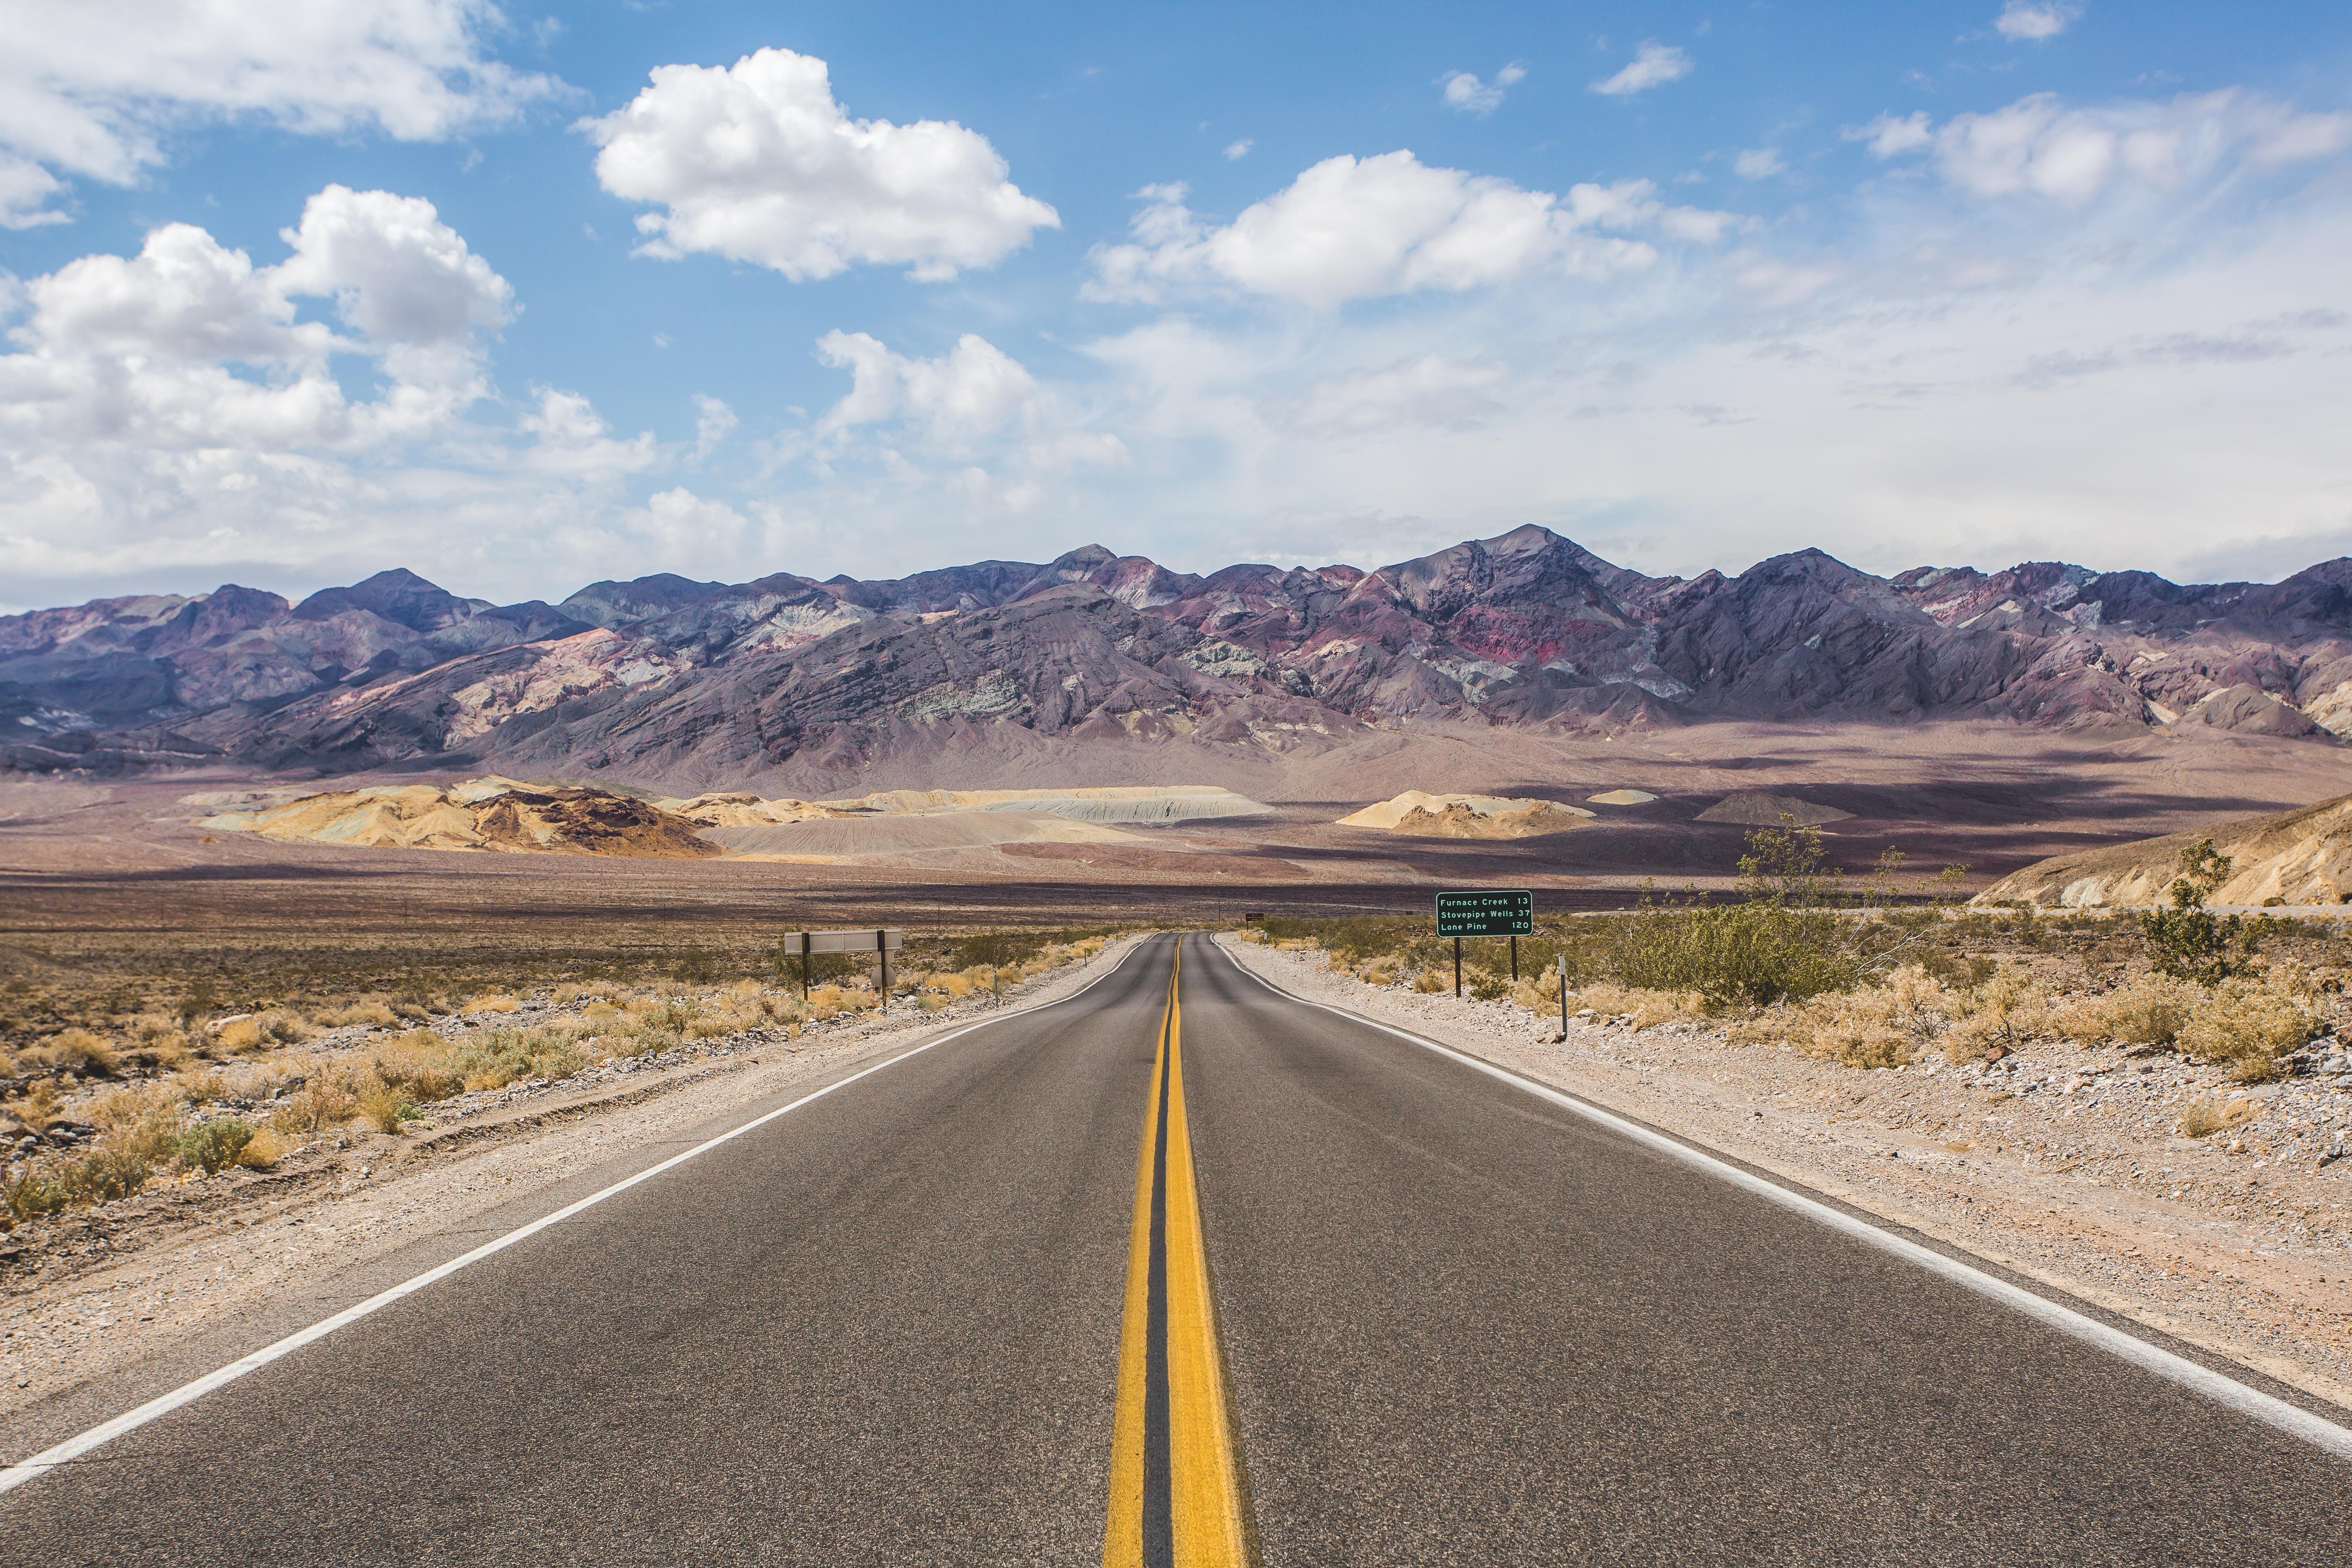 centralized photography of asphalt road